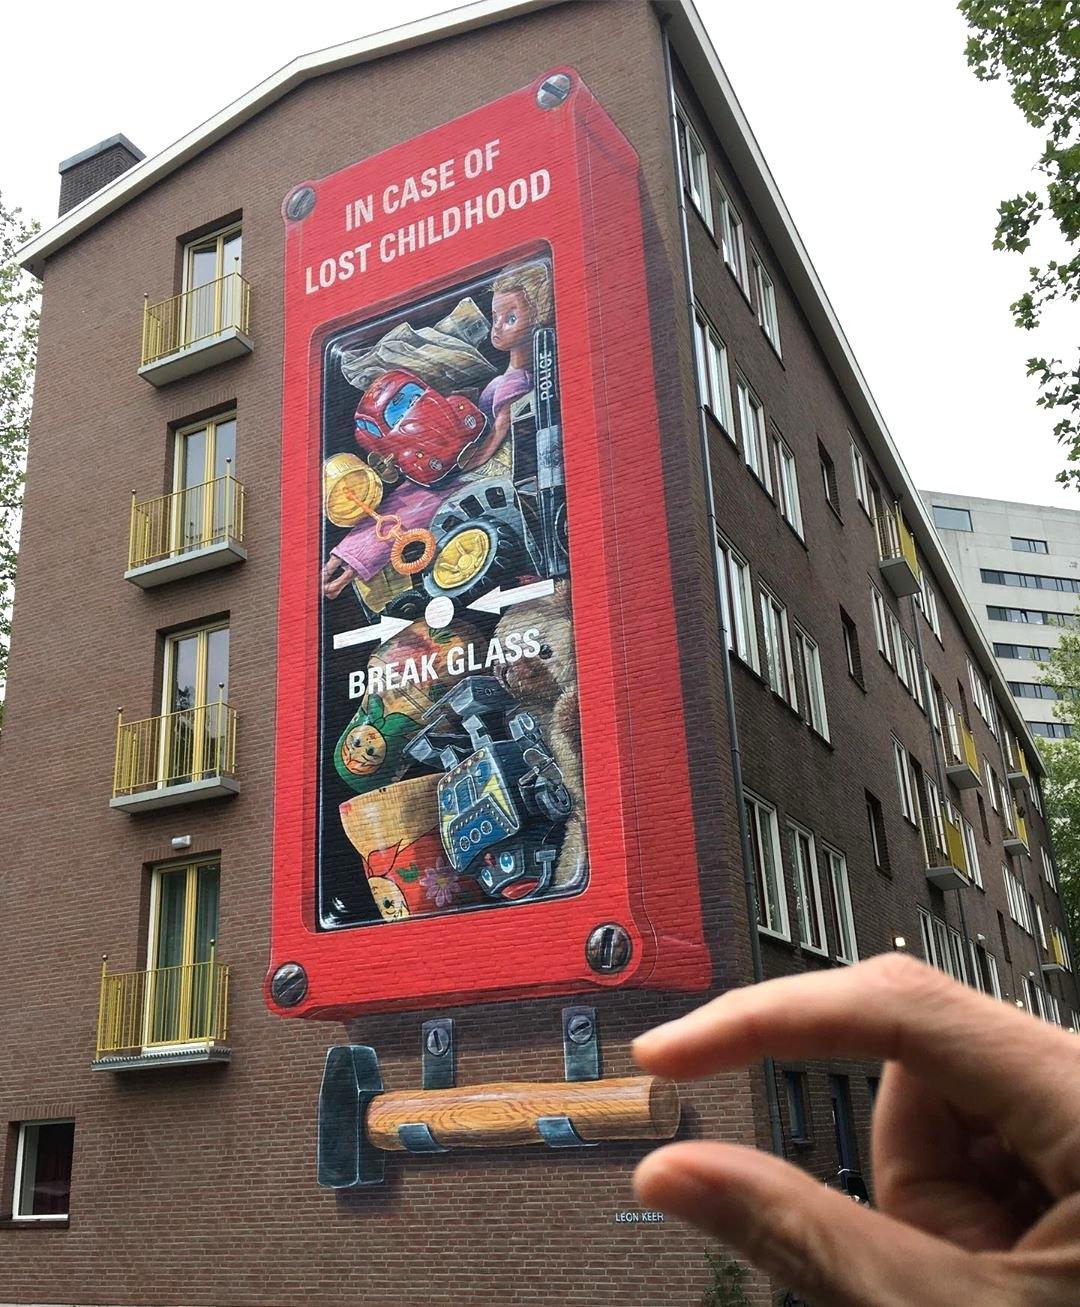 Streetart – Leon Keer @ Amsterdam, Netherlands